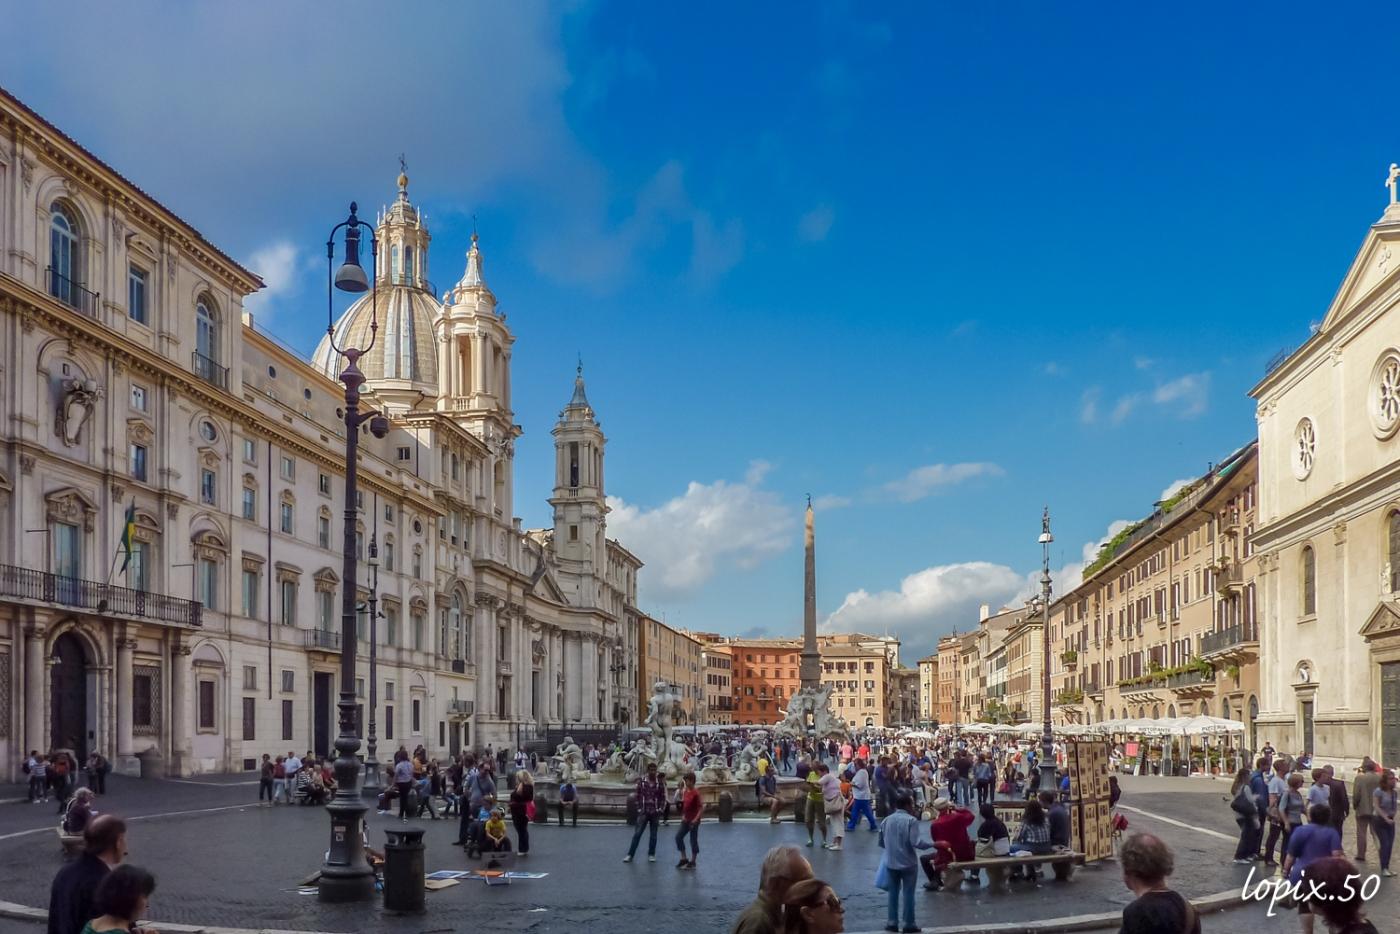 quatre-jours-a-rome-#2-absolutelyfemme.com